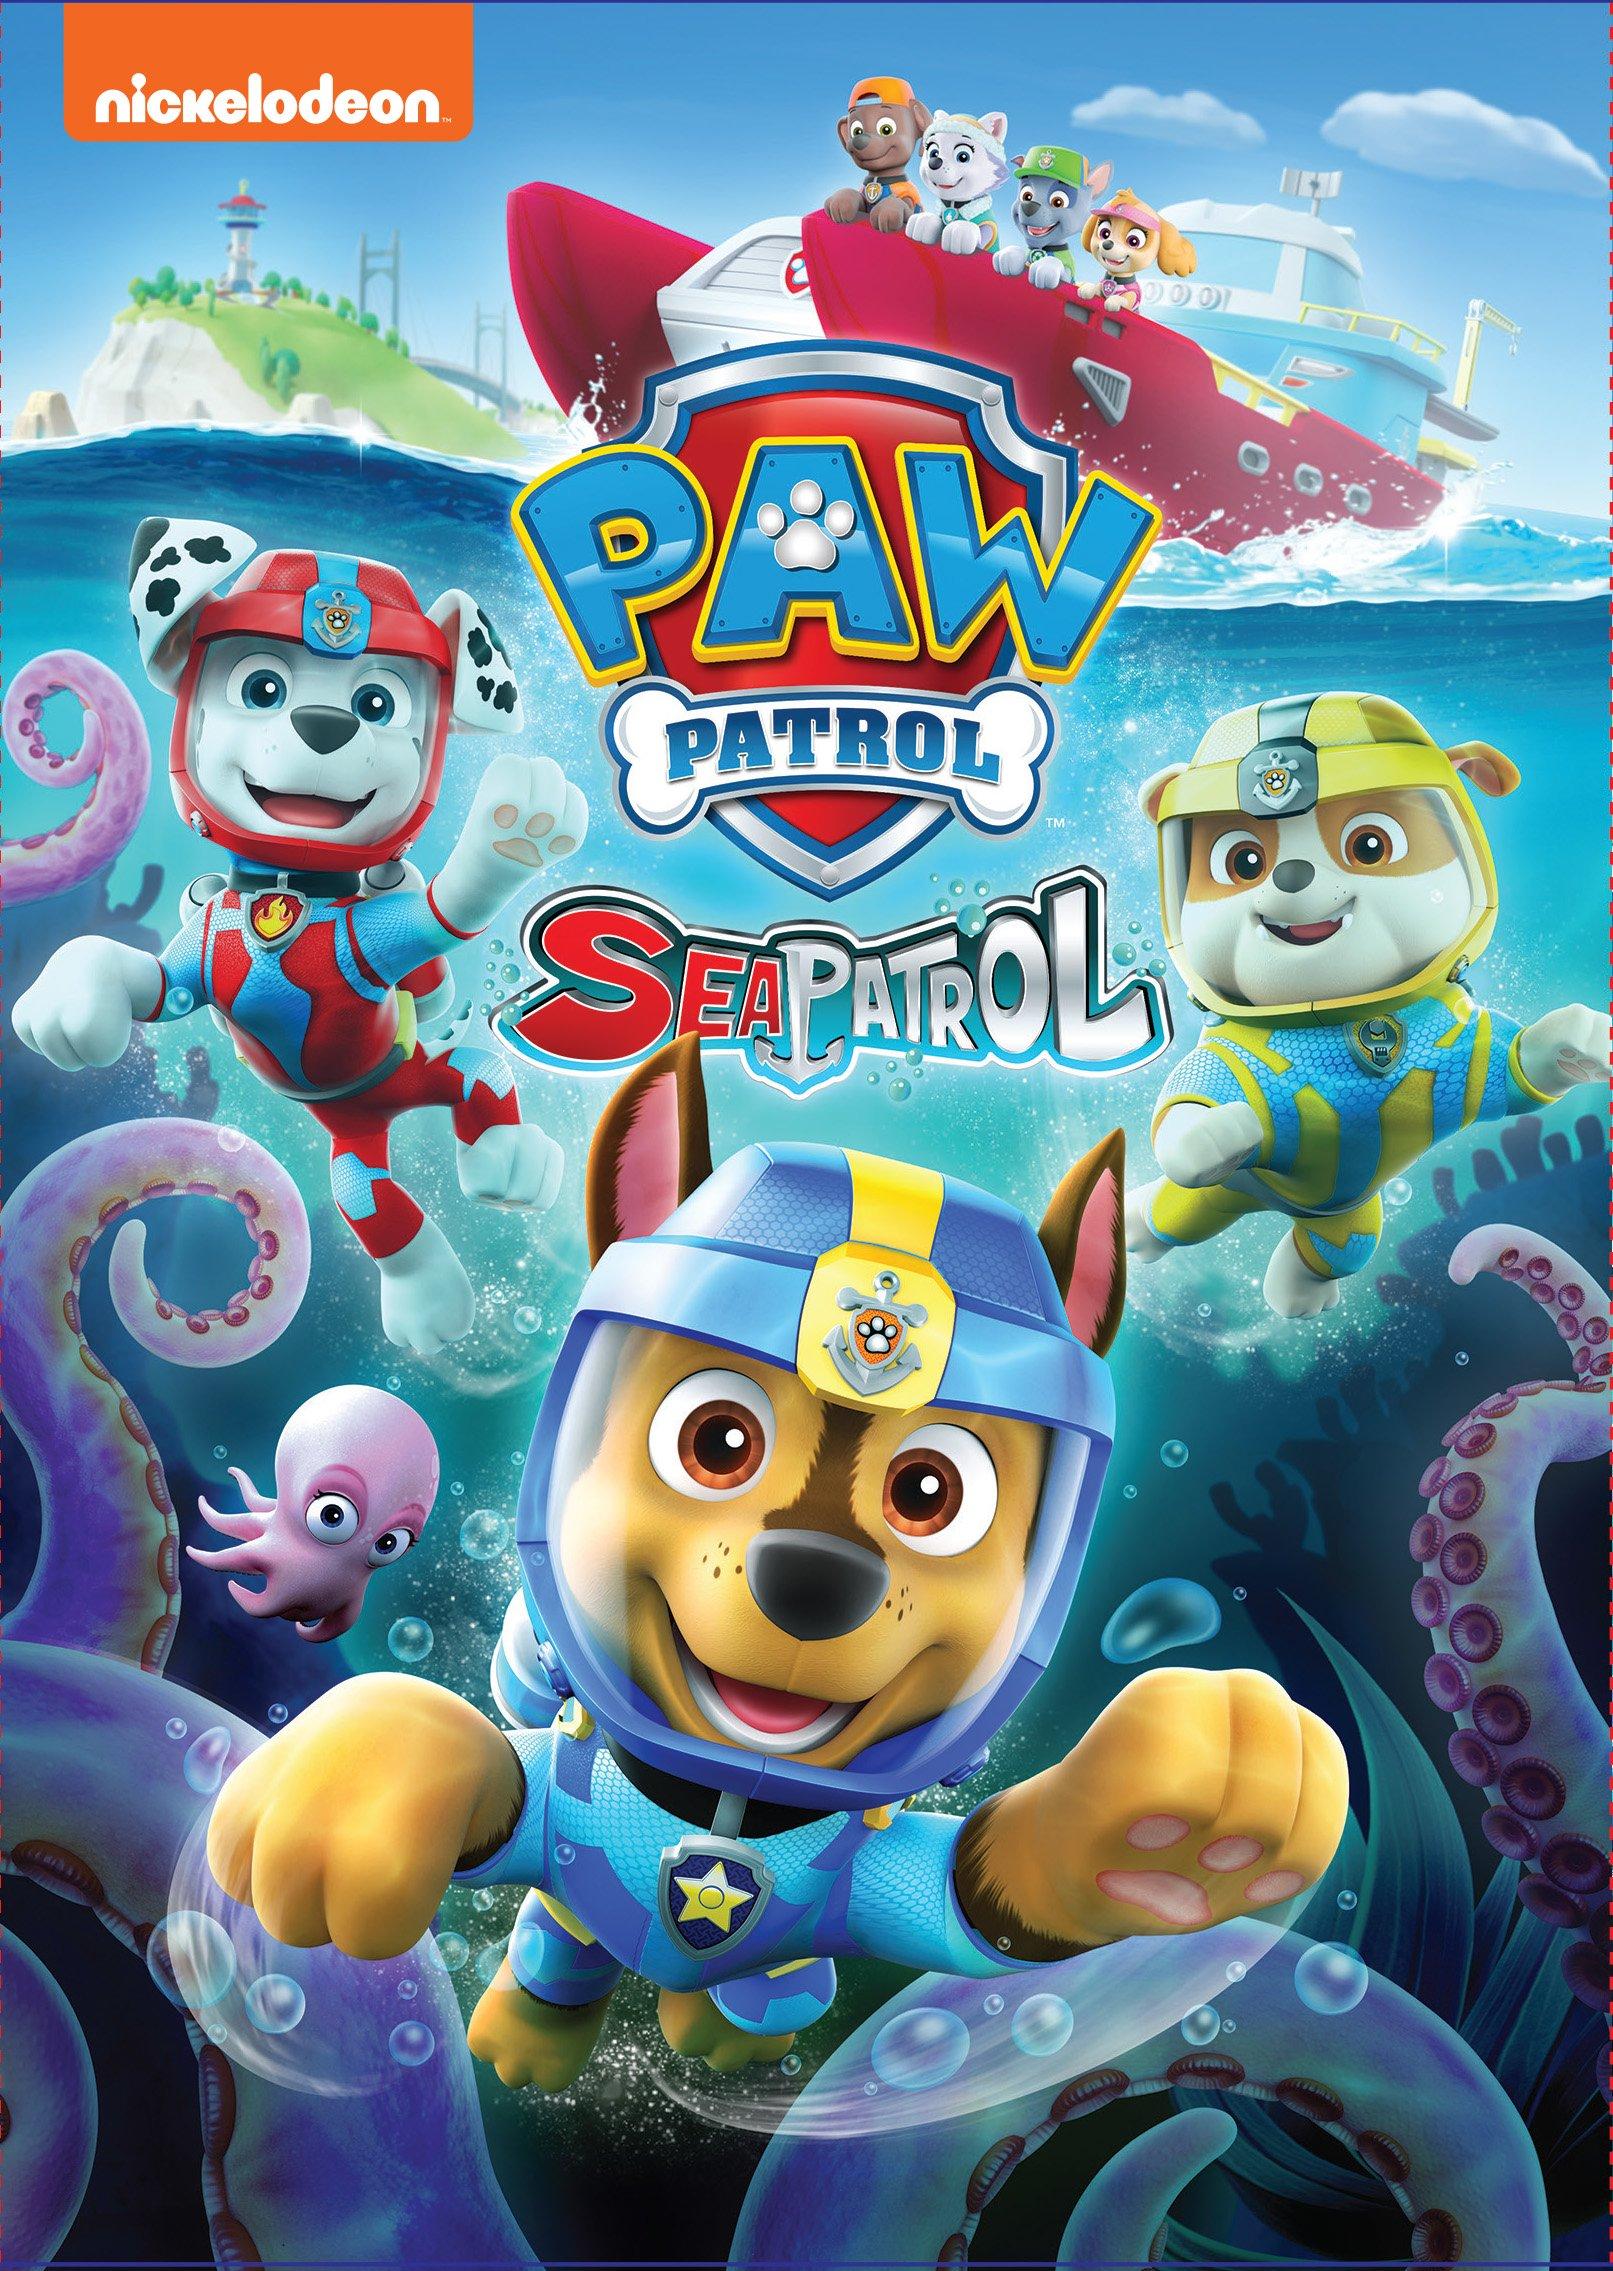 DVD : Paw Patrol: Sea Patrol (Steelbook, Widescreen)